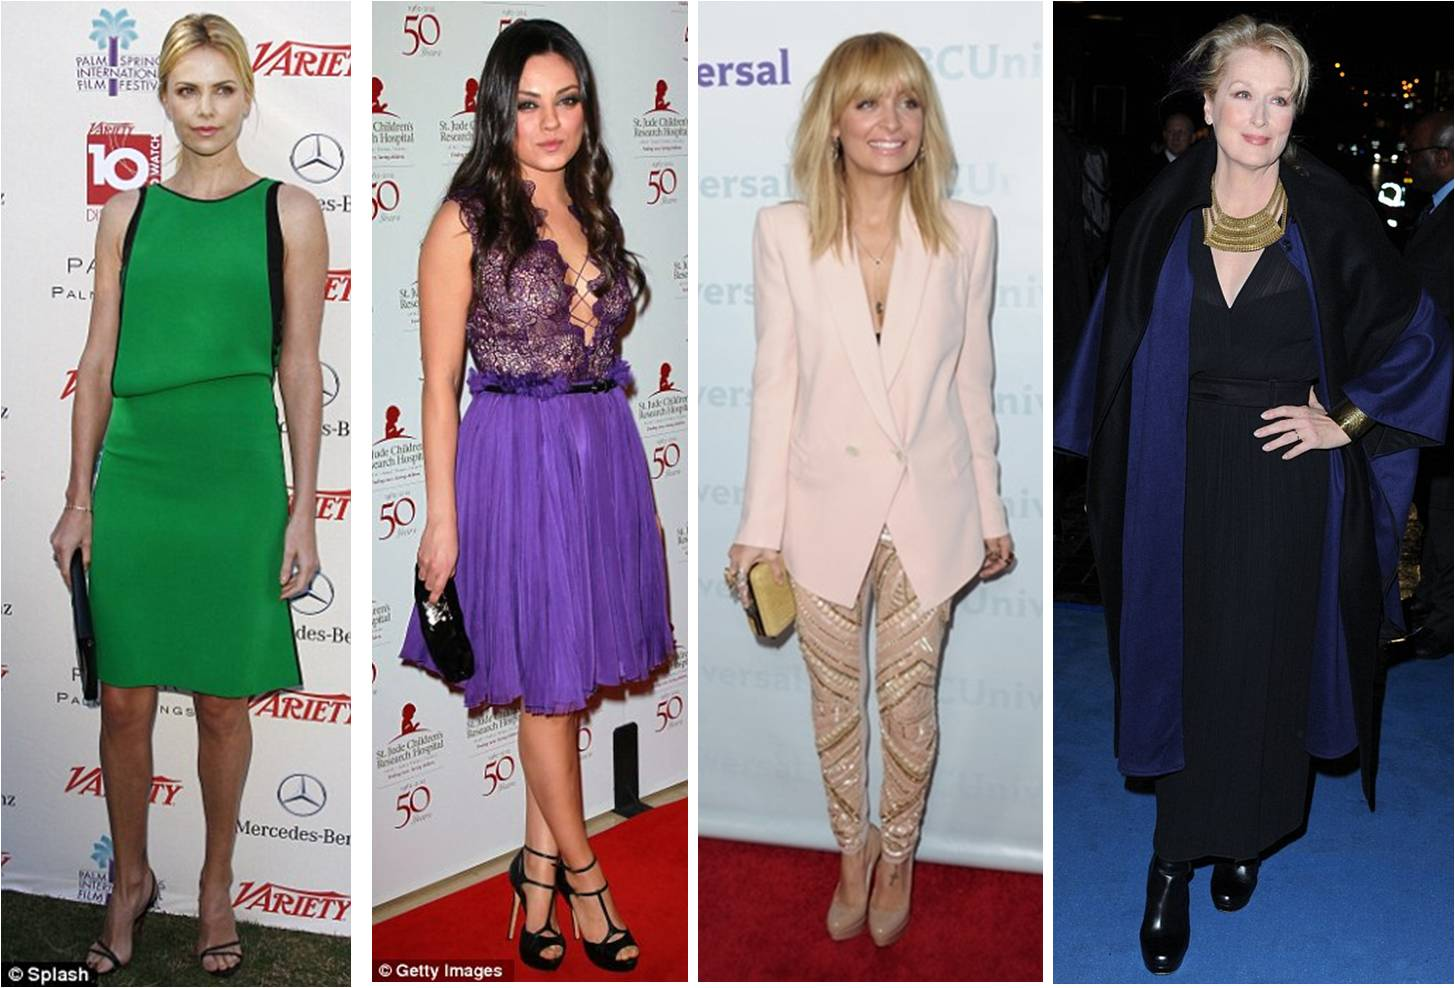 http://1.bp.blogspot.com/-upbZq1eTrQQ/TwqOsoALXCI/AAAAAAAAIXs/VPHlNWAmQaw/s1600/Looks+I+Loved+This+Weekend+Charlize+Theron+Mila+Kunis+Nicole+Richie+Meryl+Streep.jpg